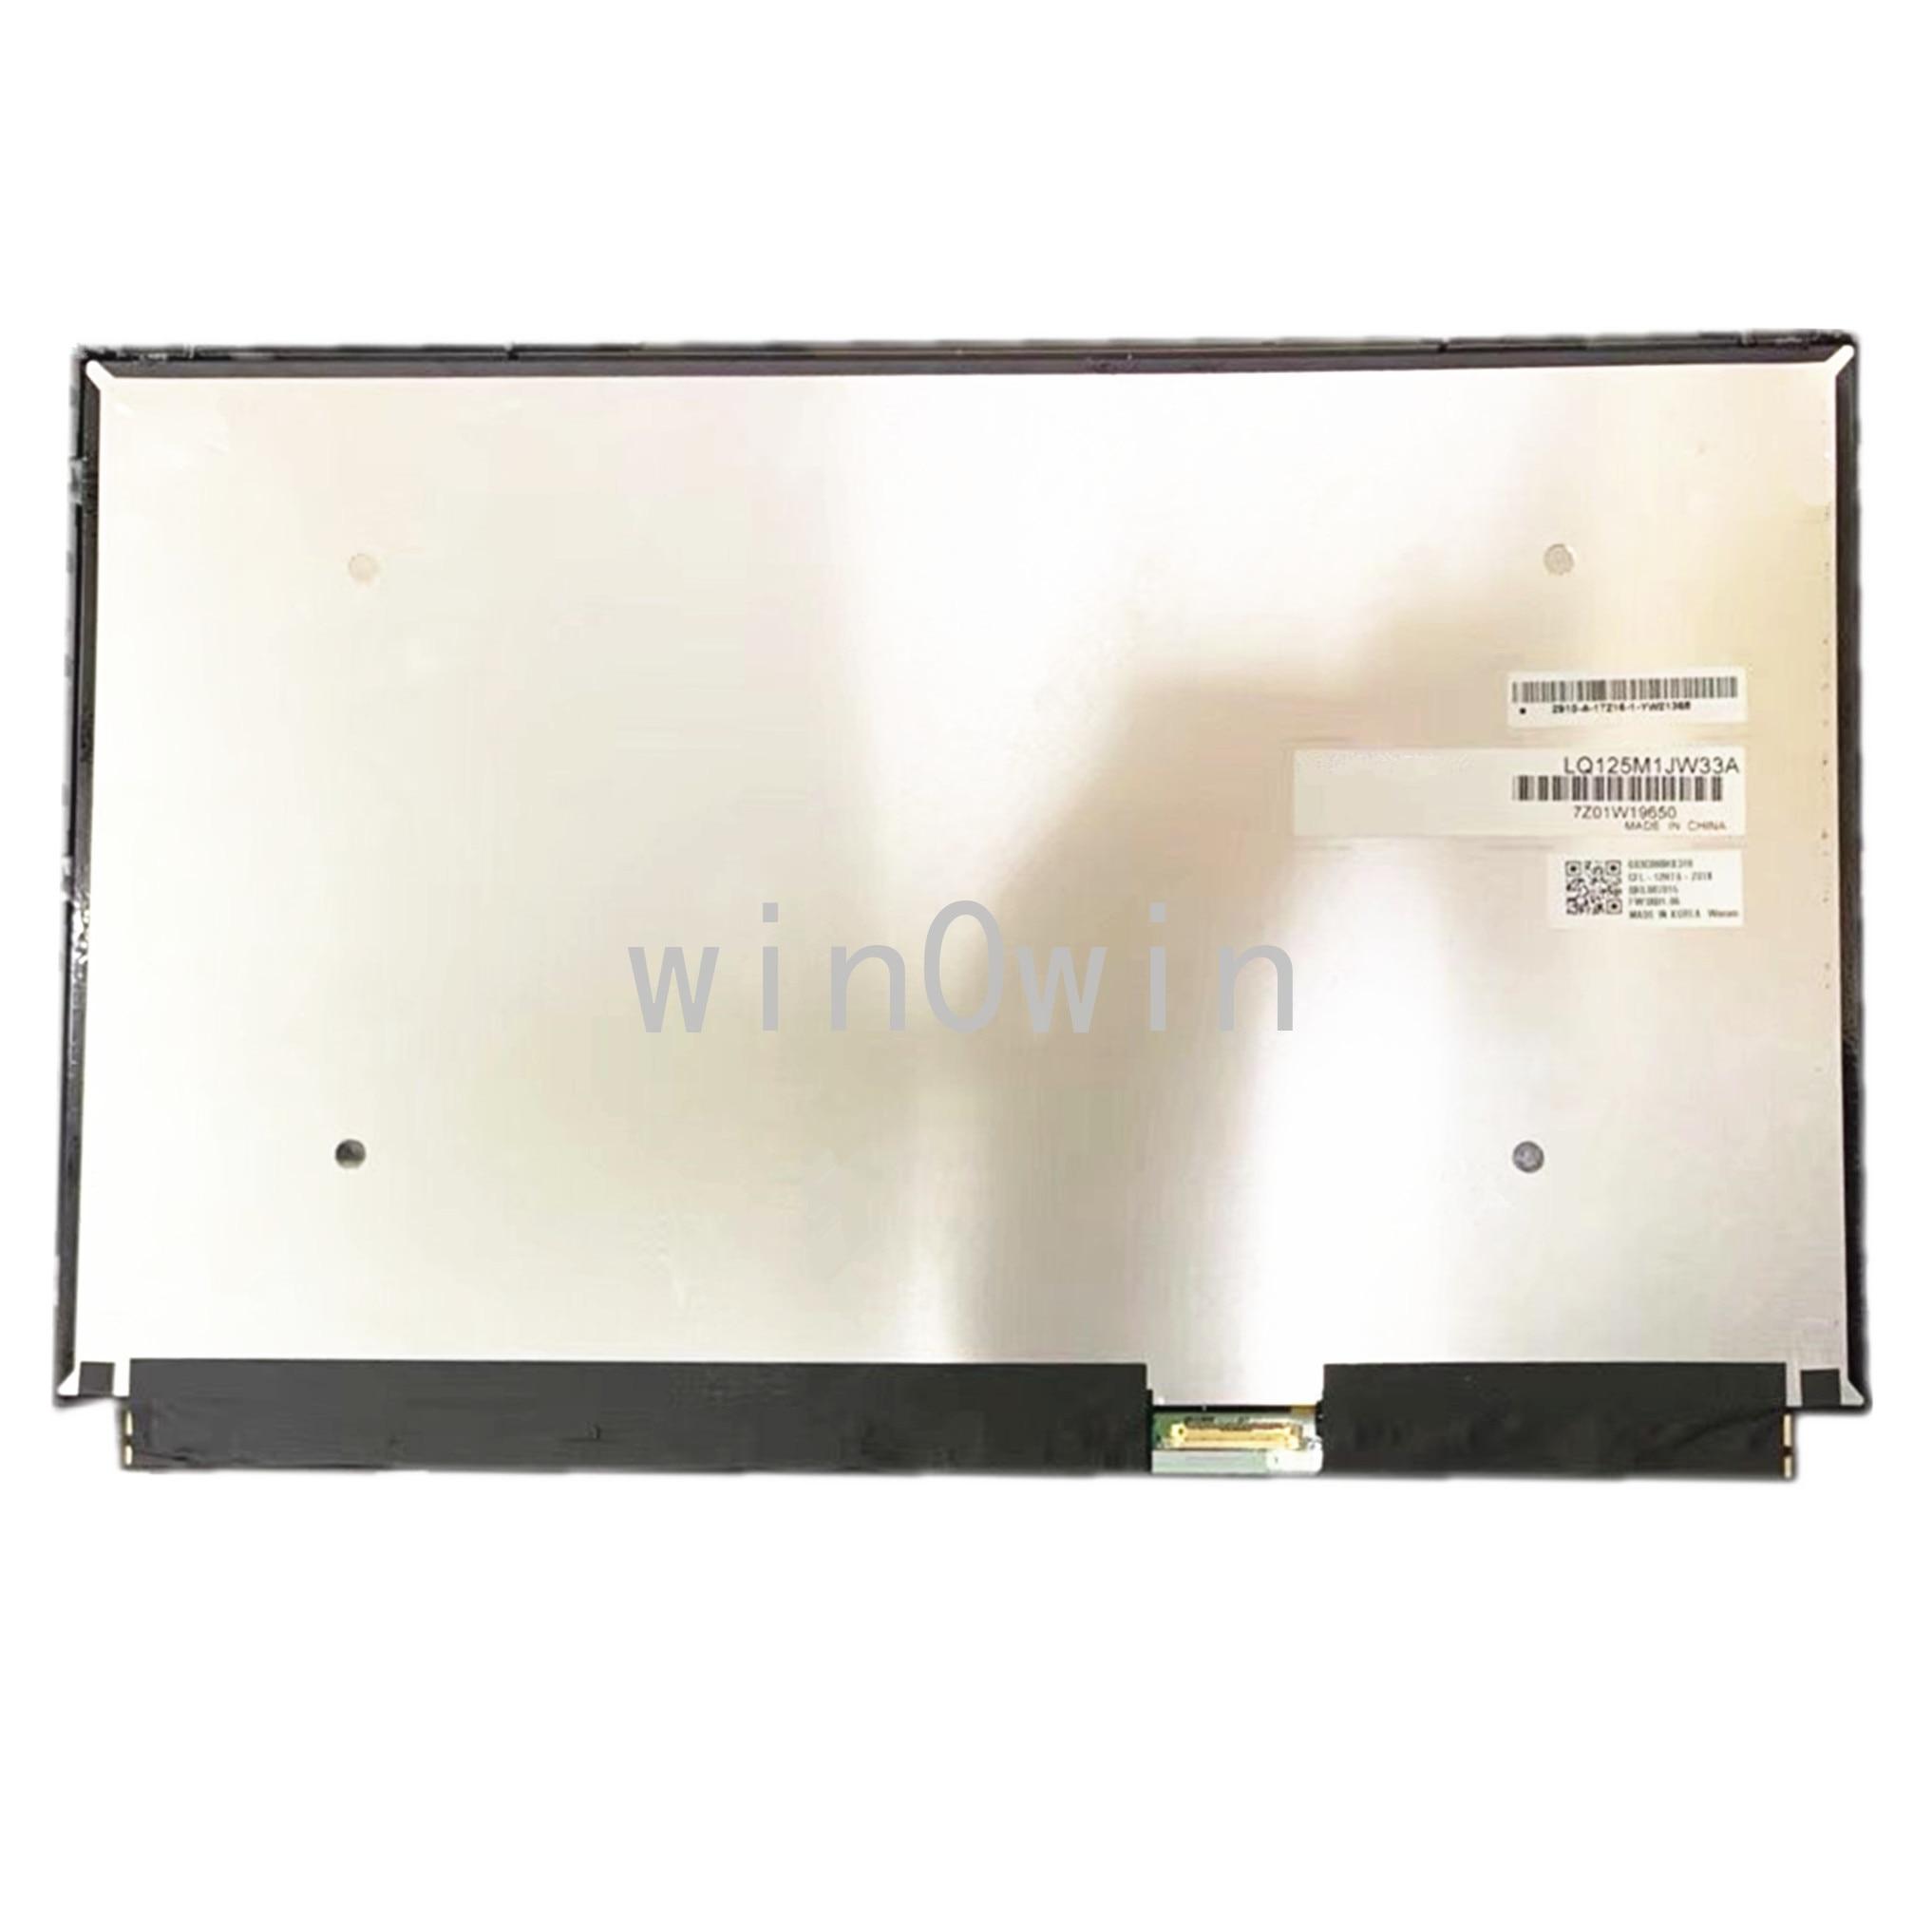 "LQ125M1JW33A fit LQ125M1JW33 12.5""LED LCD Screen for Toshiba Satellite P25w-c Series1920x1080"